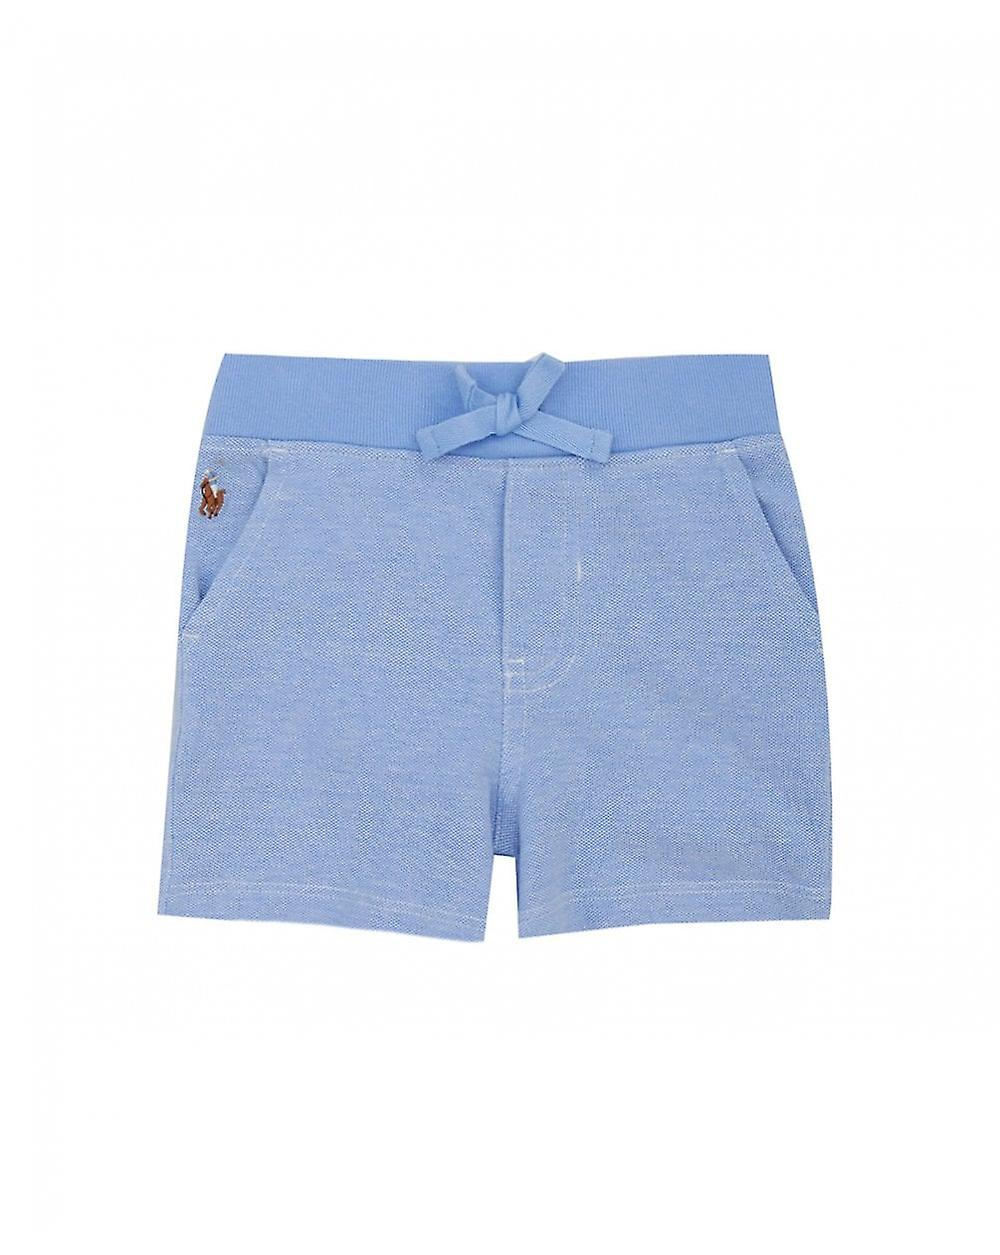 NUOVA linea donna Spencer Giallo Marks /& Affusolata Crop Pantaloni Taglia 18 16 12 REG breve